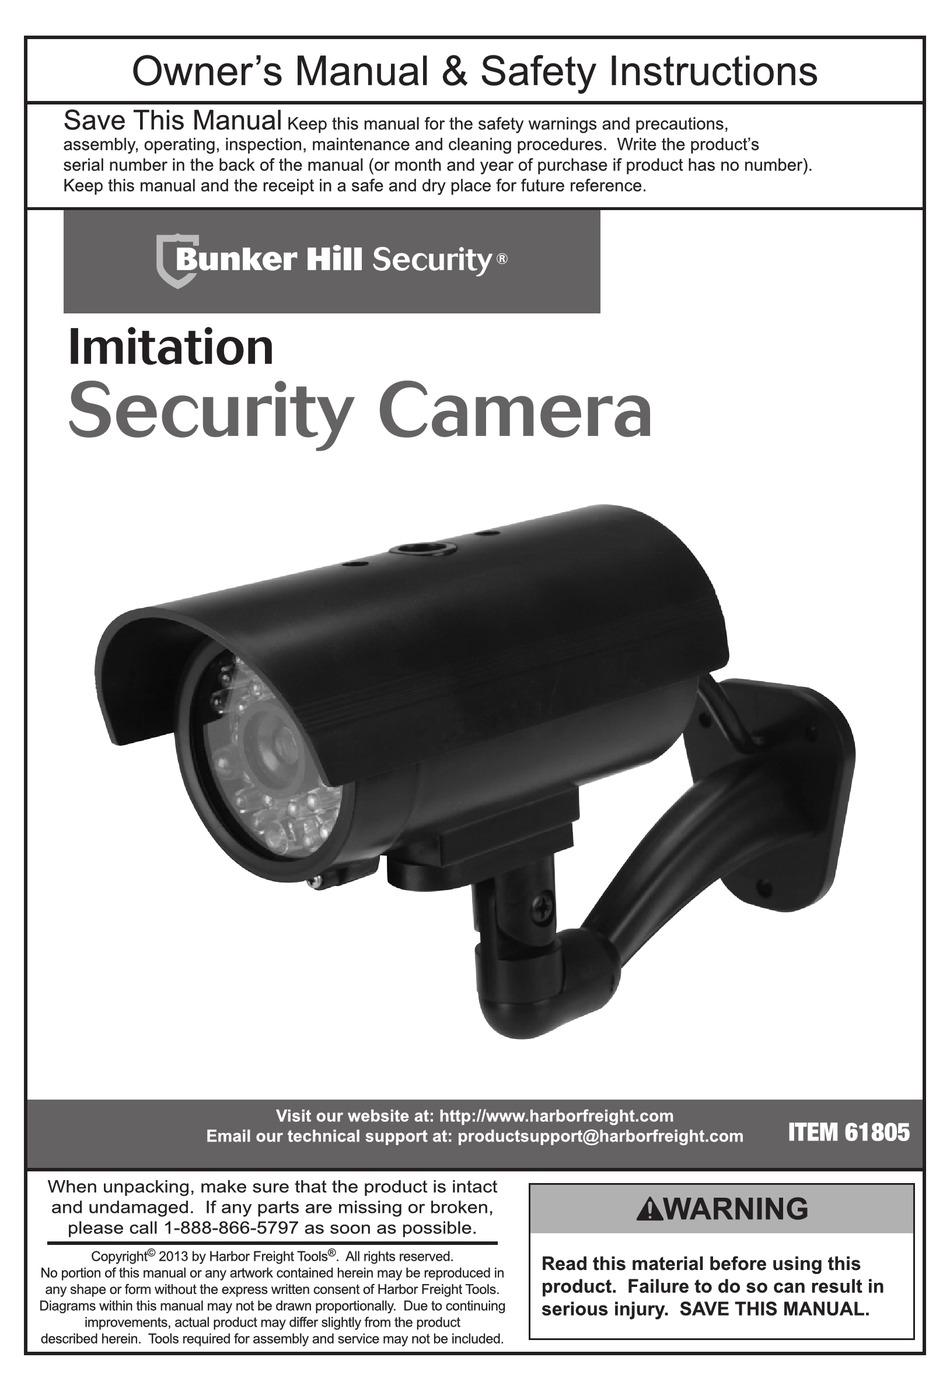 Bunker Hill Security Camera 62367 : bunker, security, camera, 62367, BUNKER, SECURITY, 61805, OWNER'S, MANUAL, SAFETY, INSTRUCTIONS, Download, ManualsLib